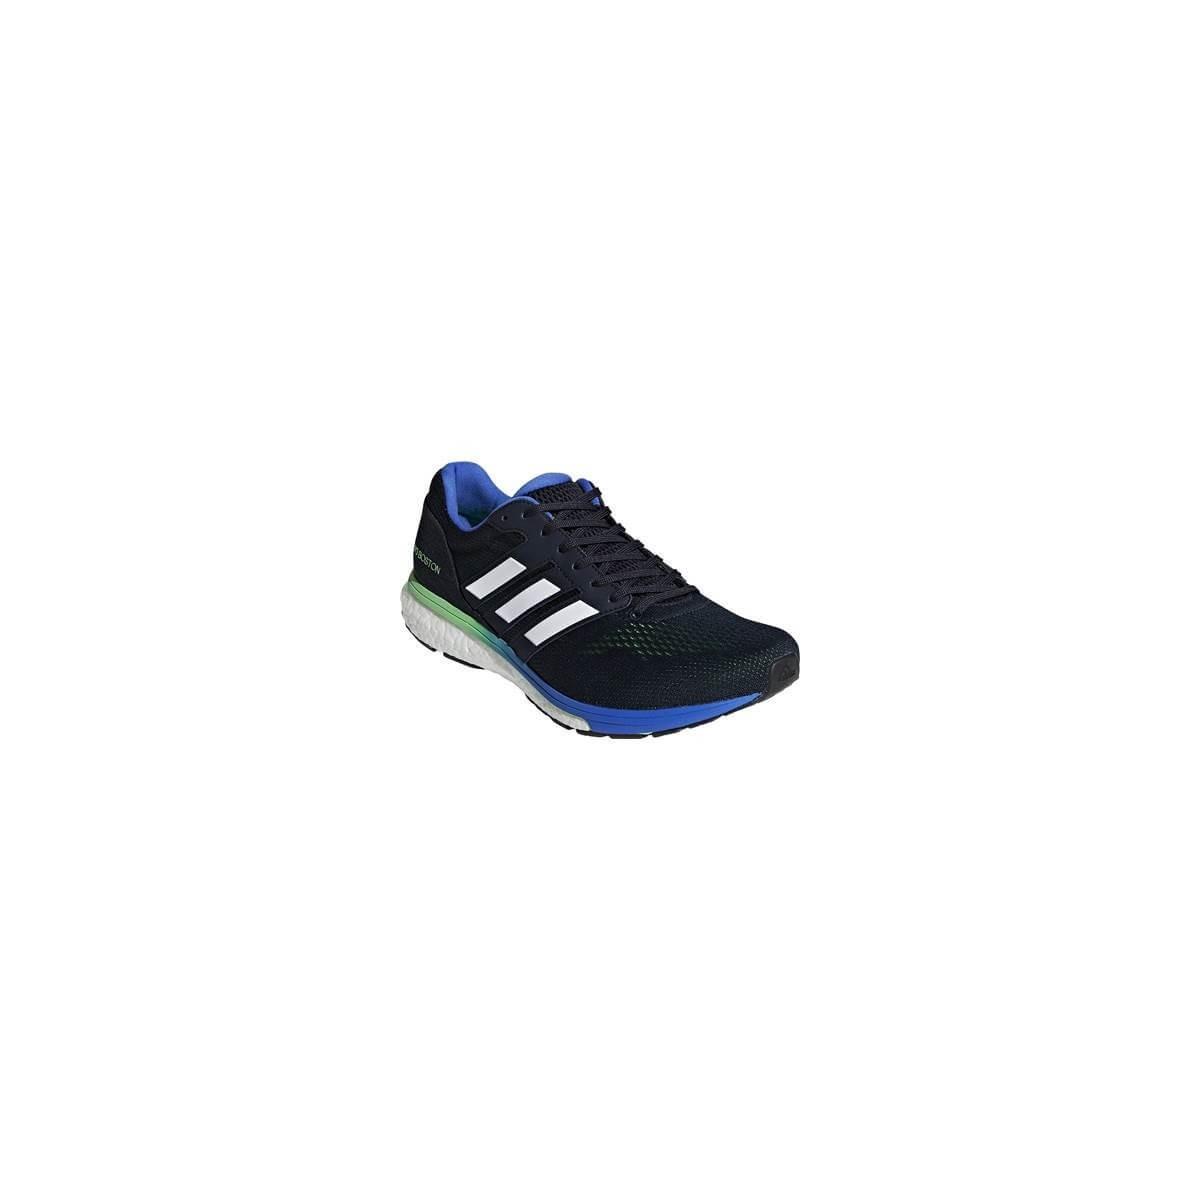 buy online 66bae ea0b6 ... Adidas Adizero Boston 7 Hombre Azul OI18 ...